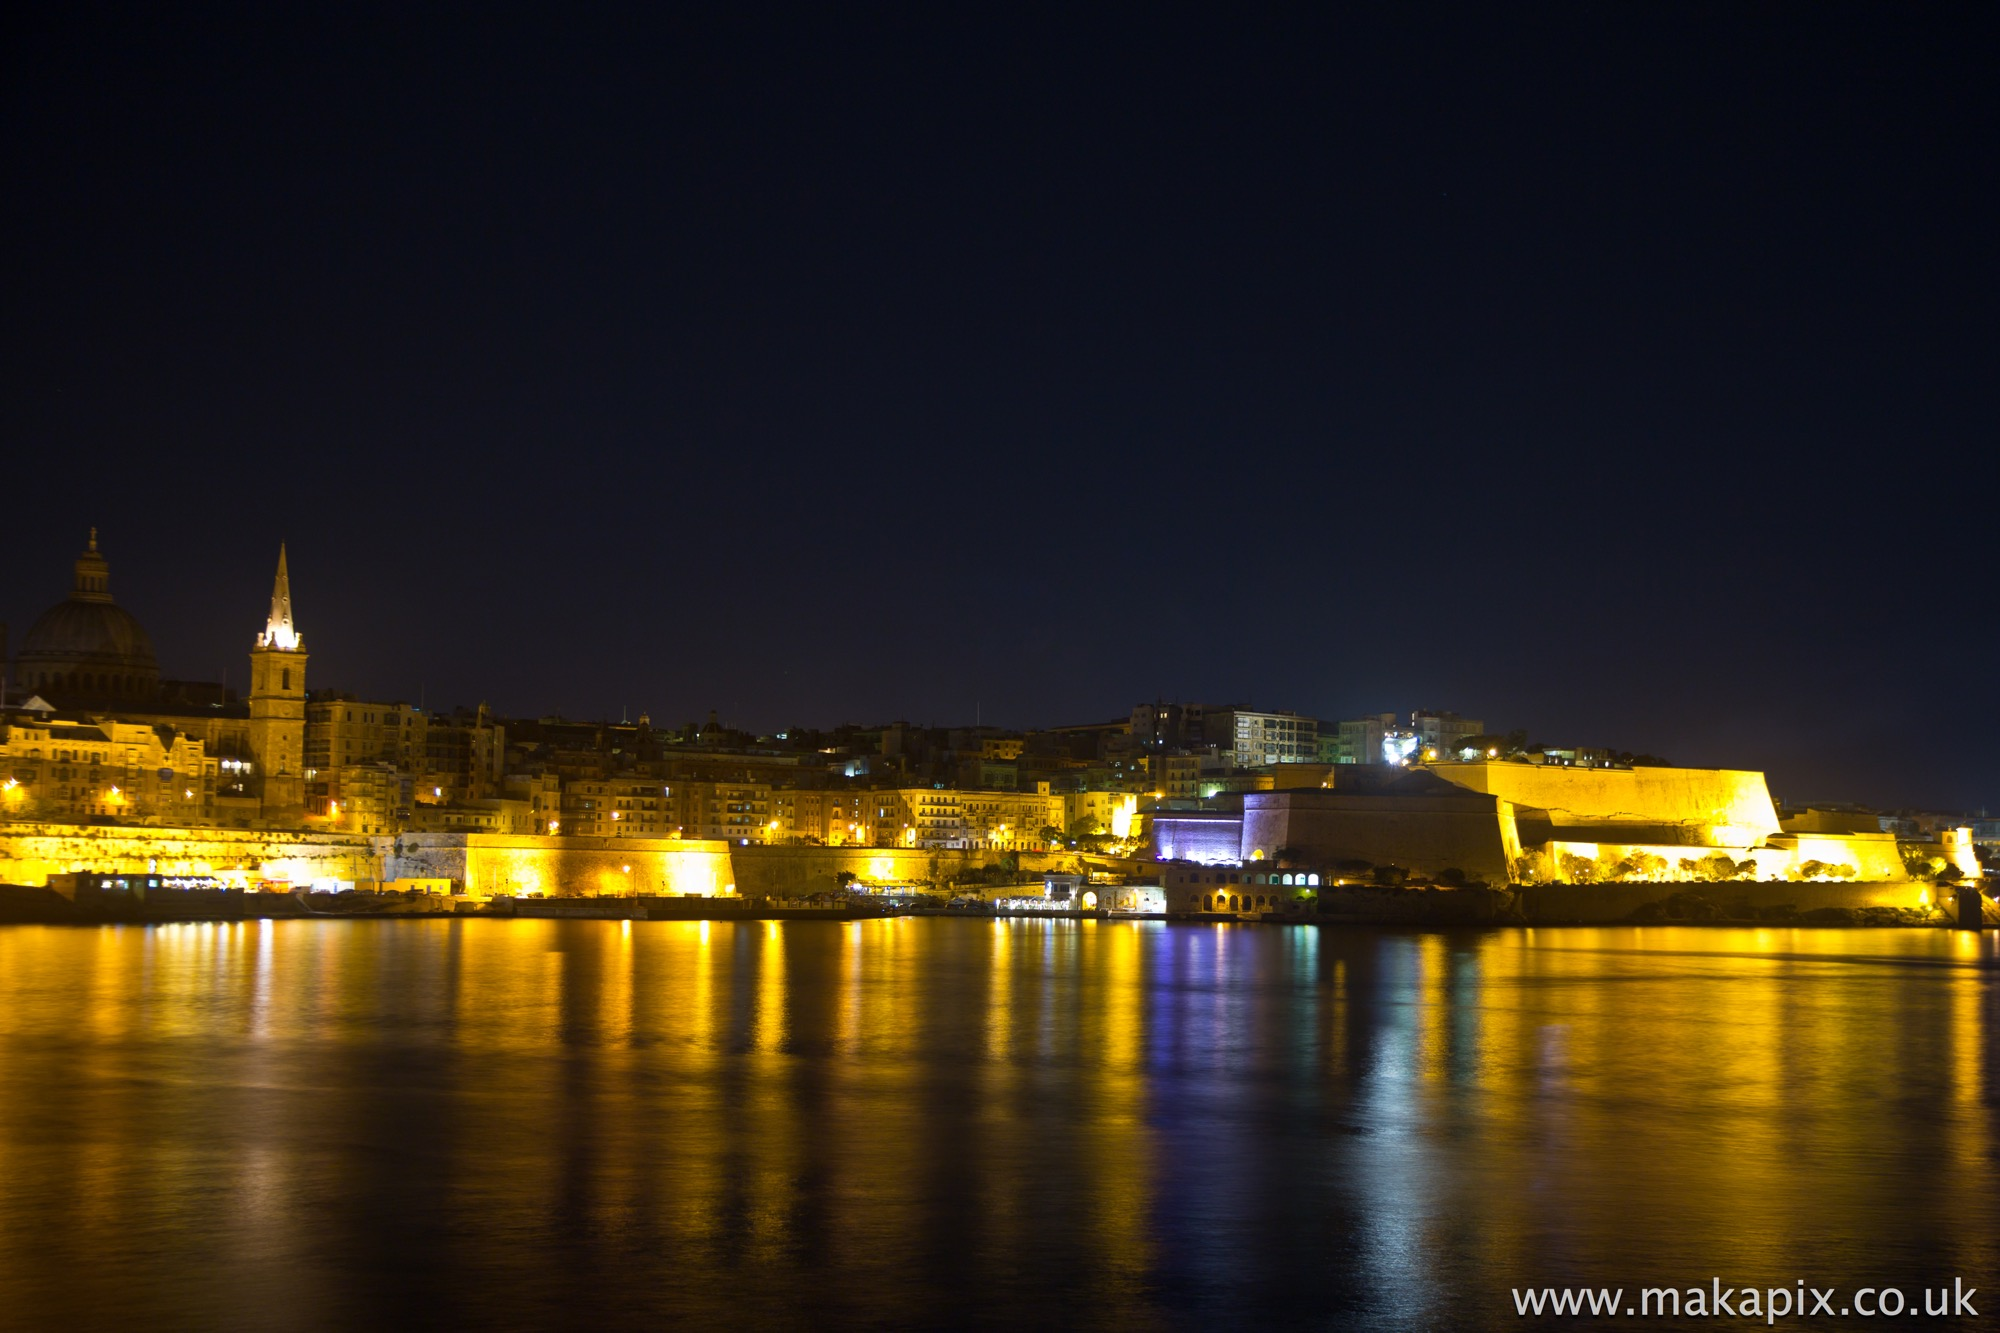 Malta-Valletta at Night 2014